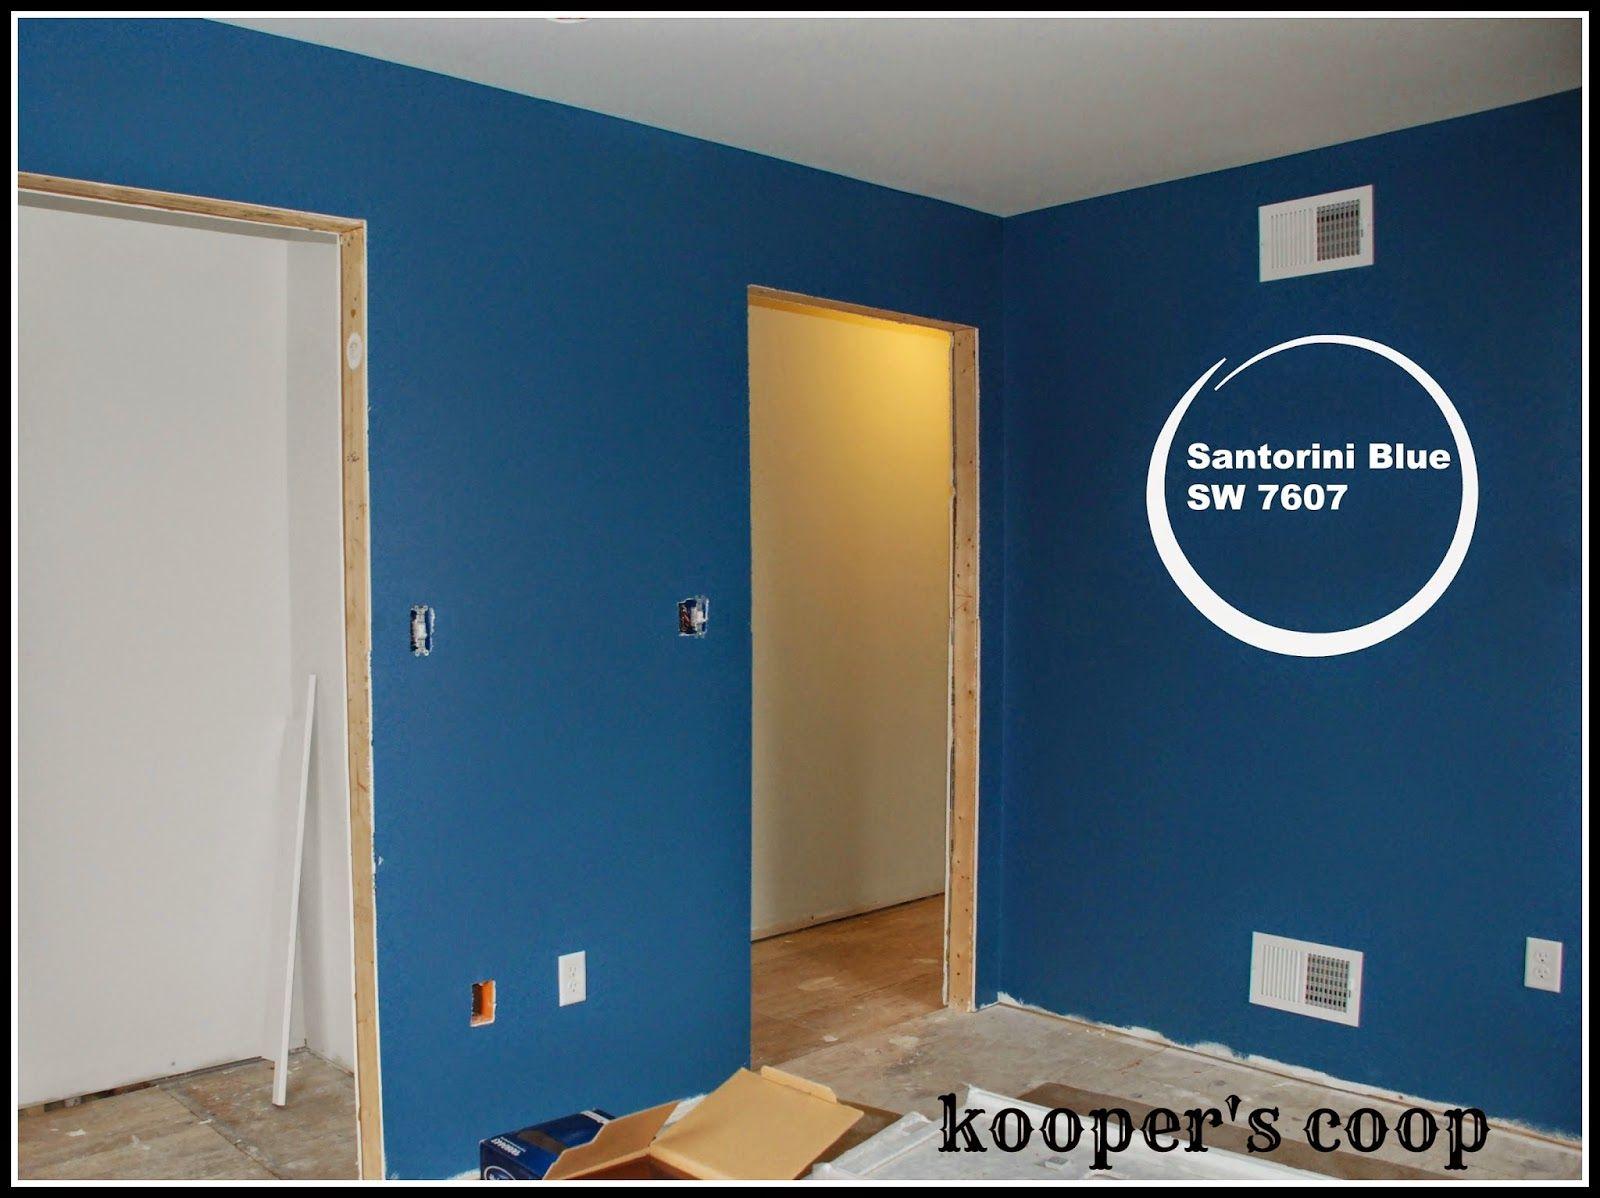 Sherwin williams santorini blue remodeling the coop for Santorini blue paint